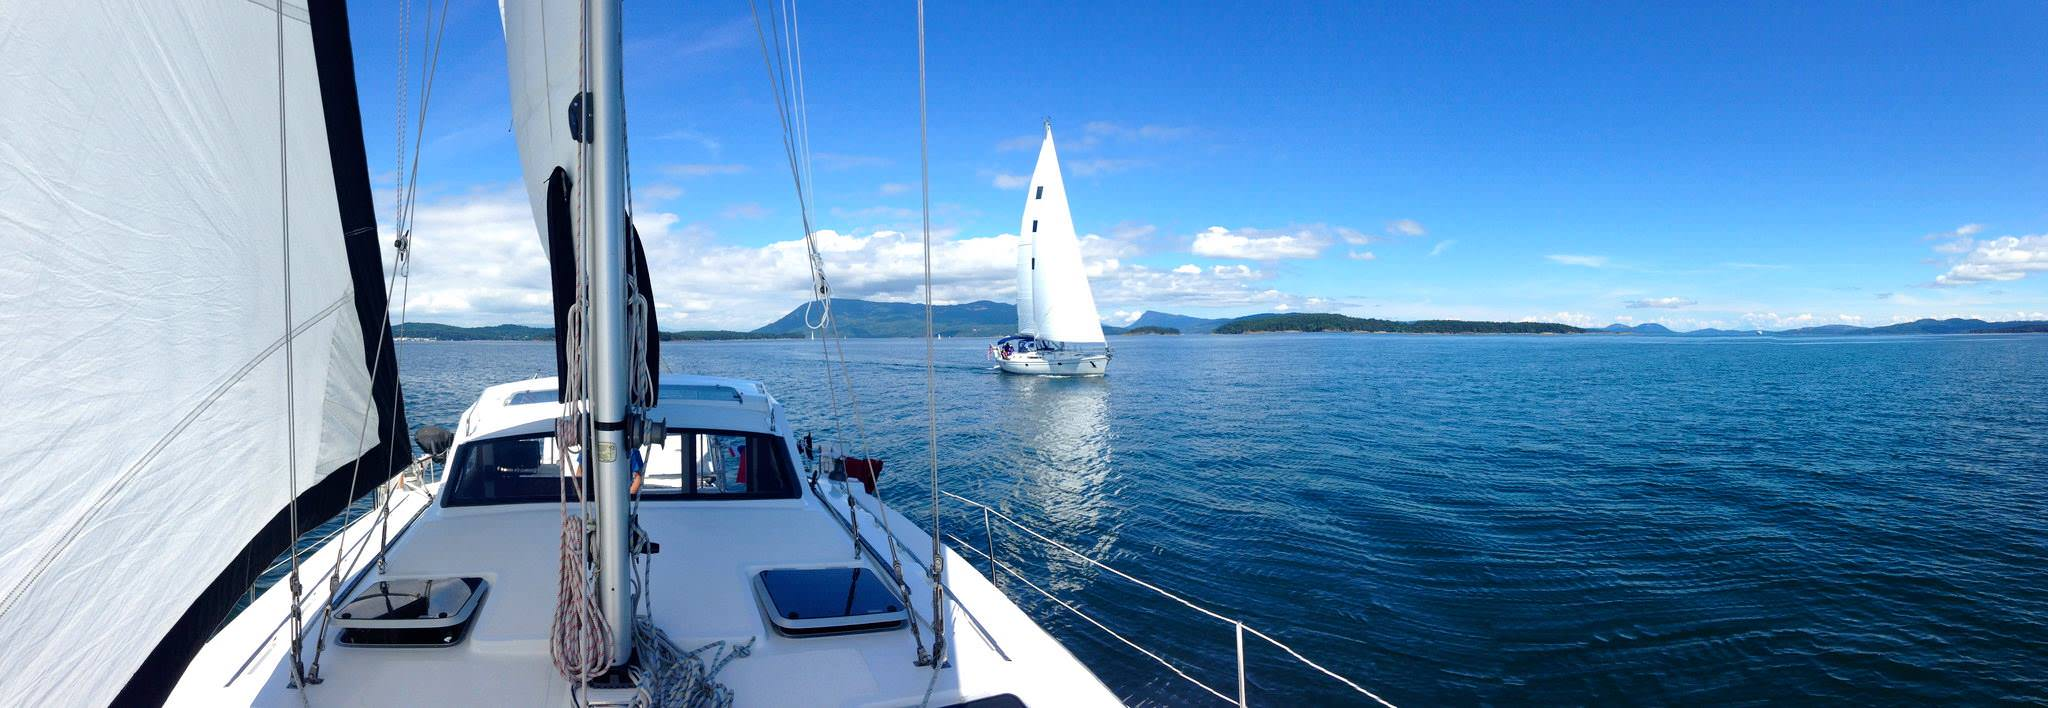 ASA flotilla in the San Juan Islands